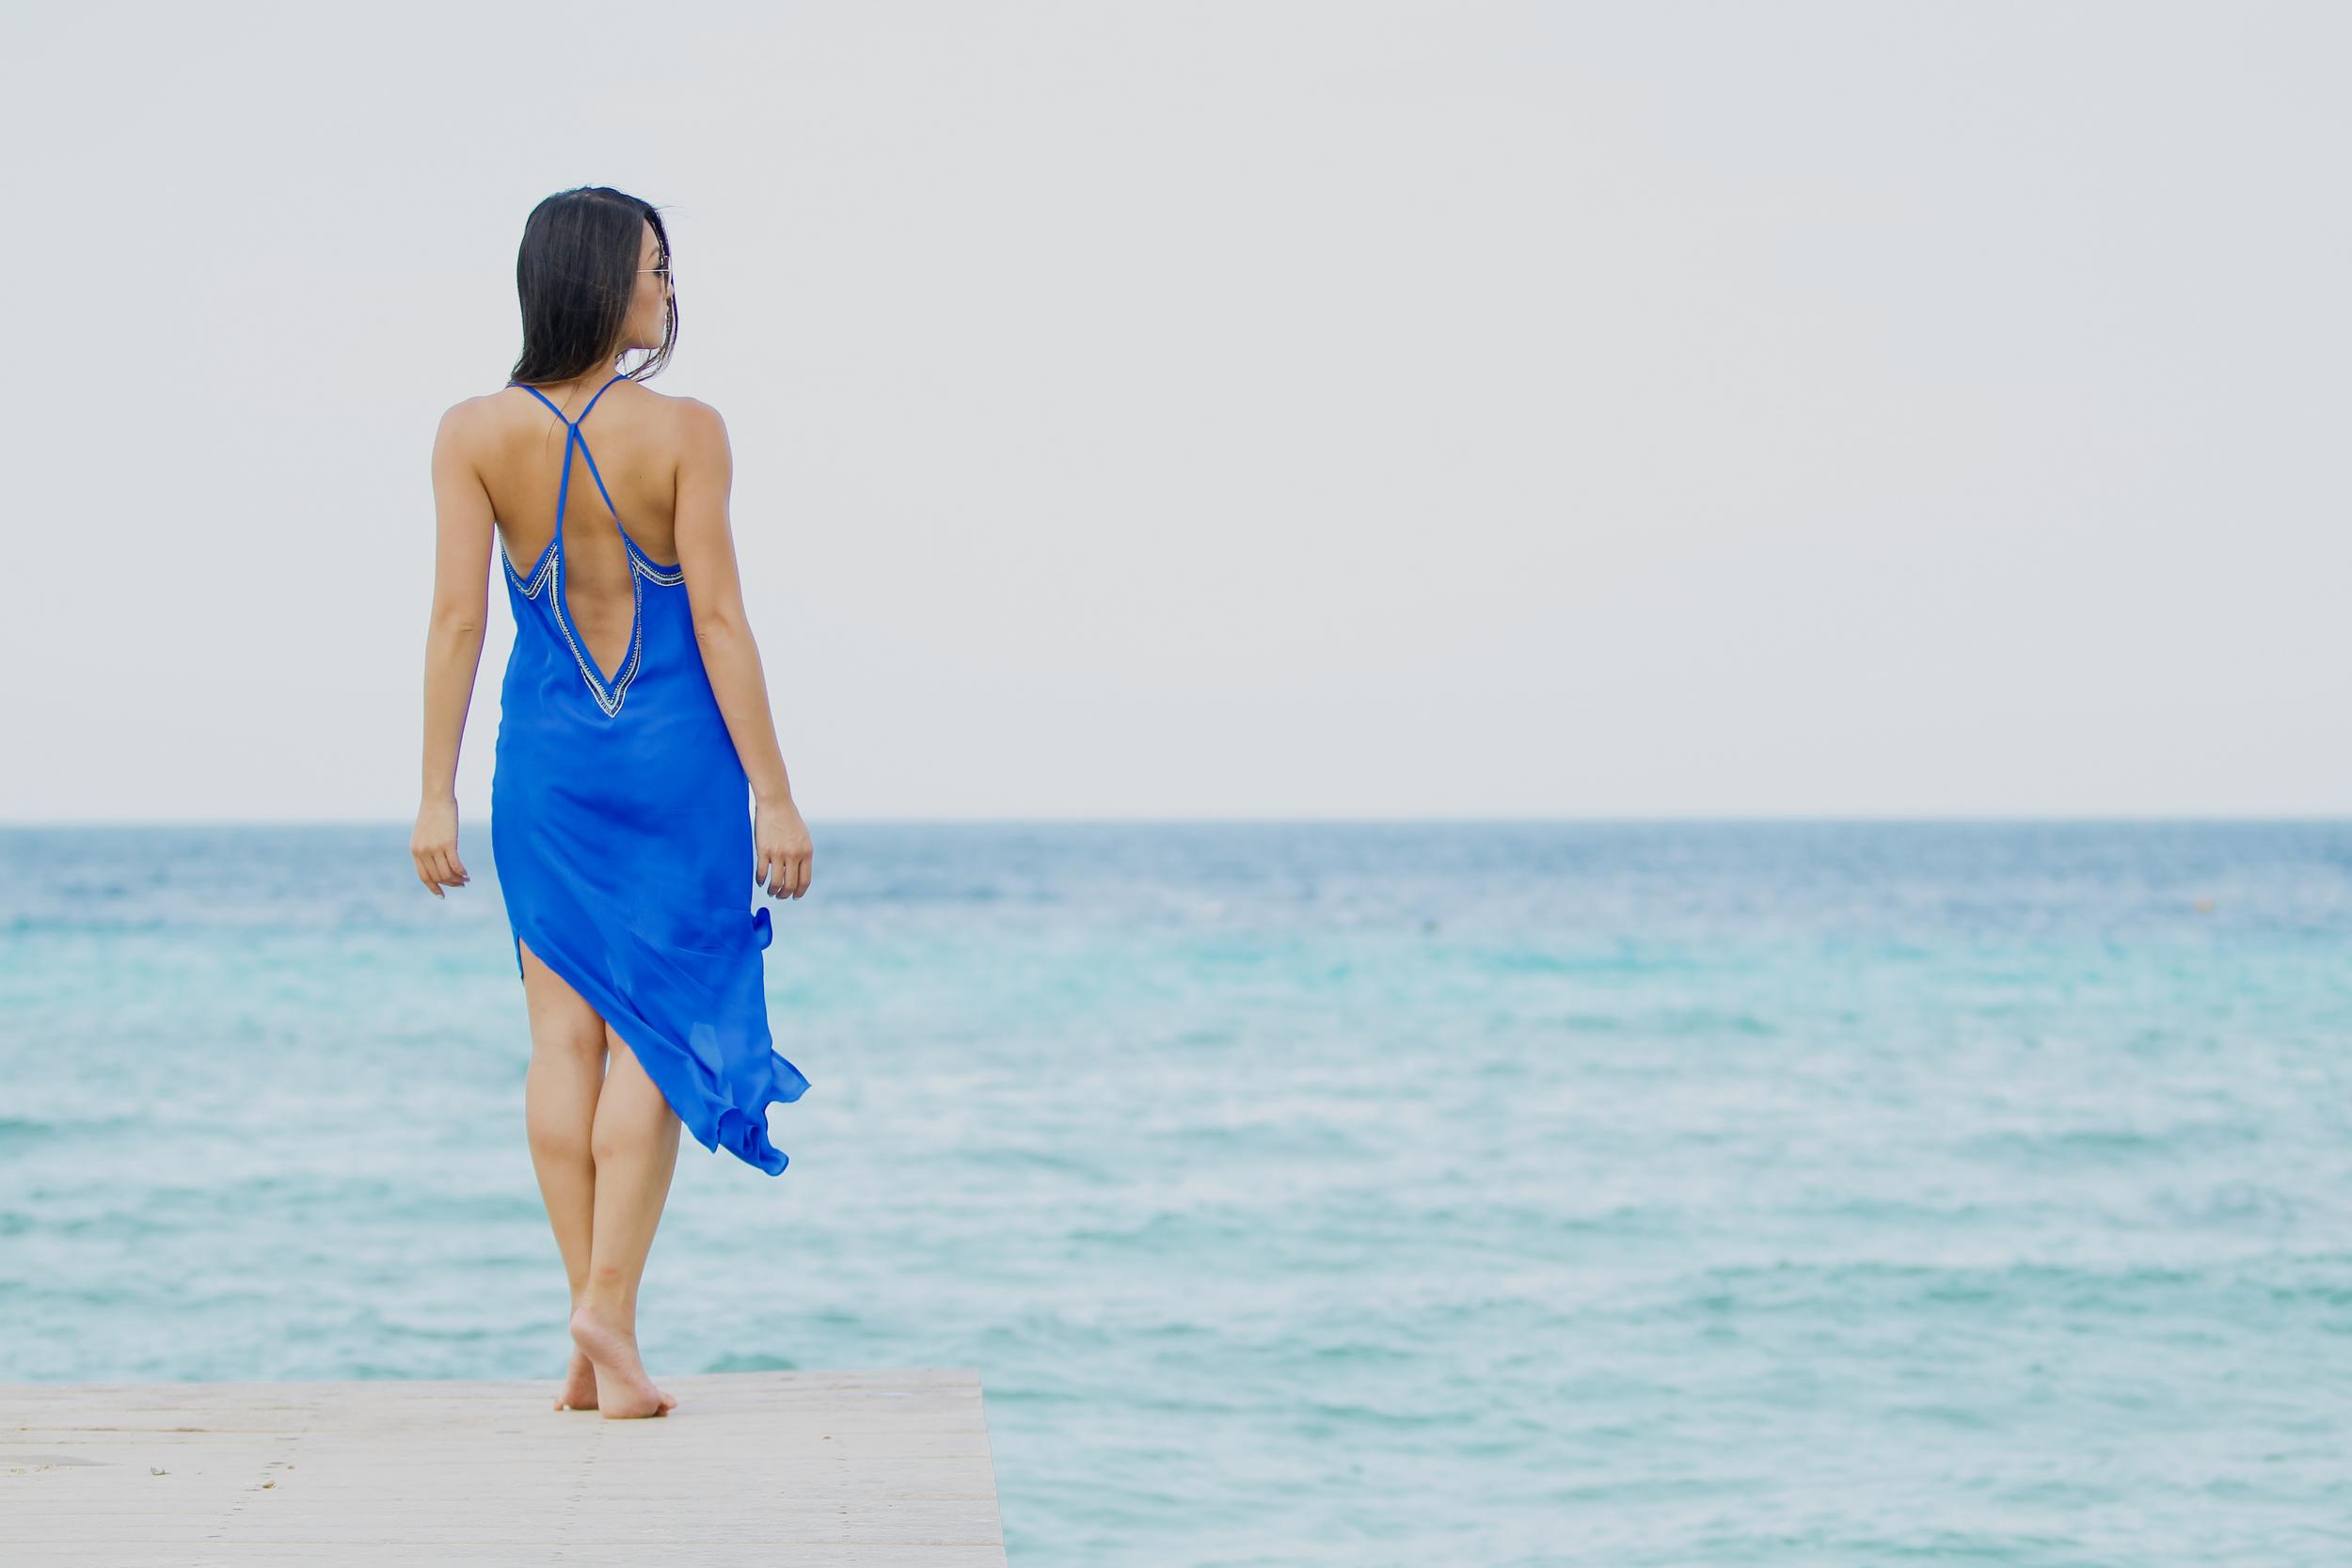 hautehippie_bluedress_beach4.jpg